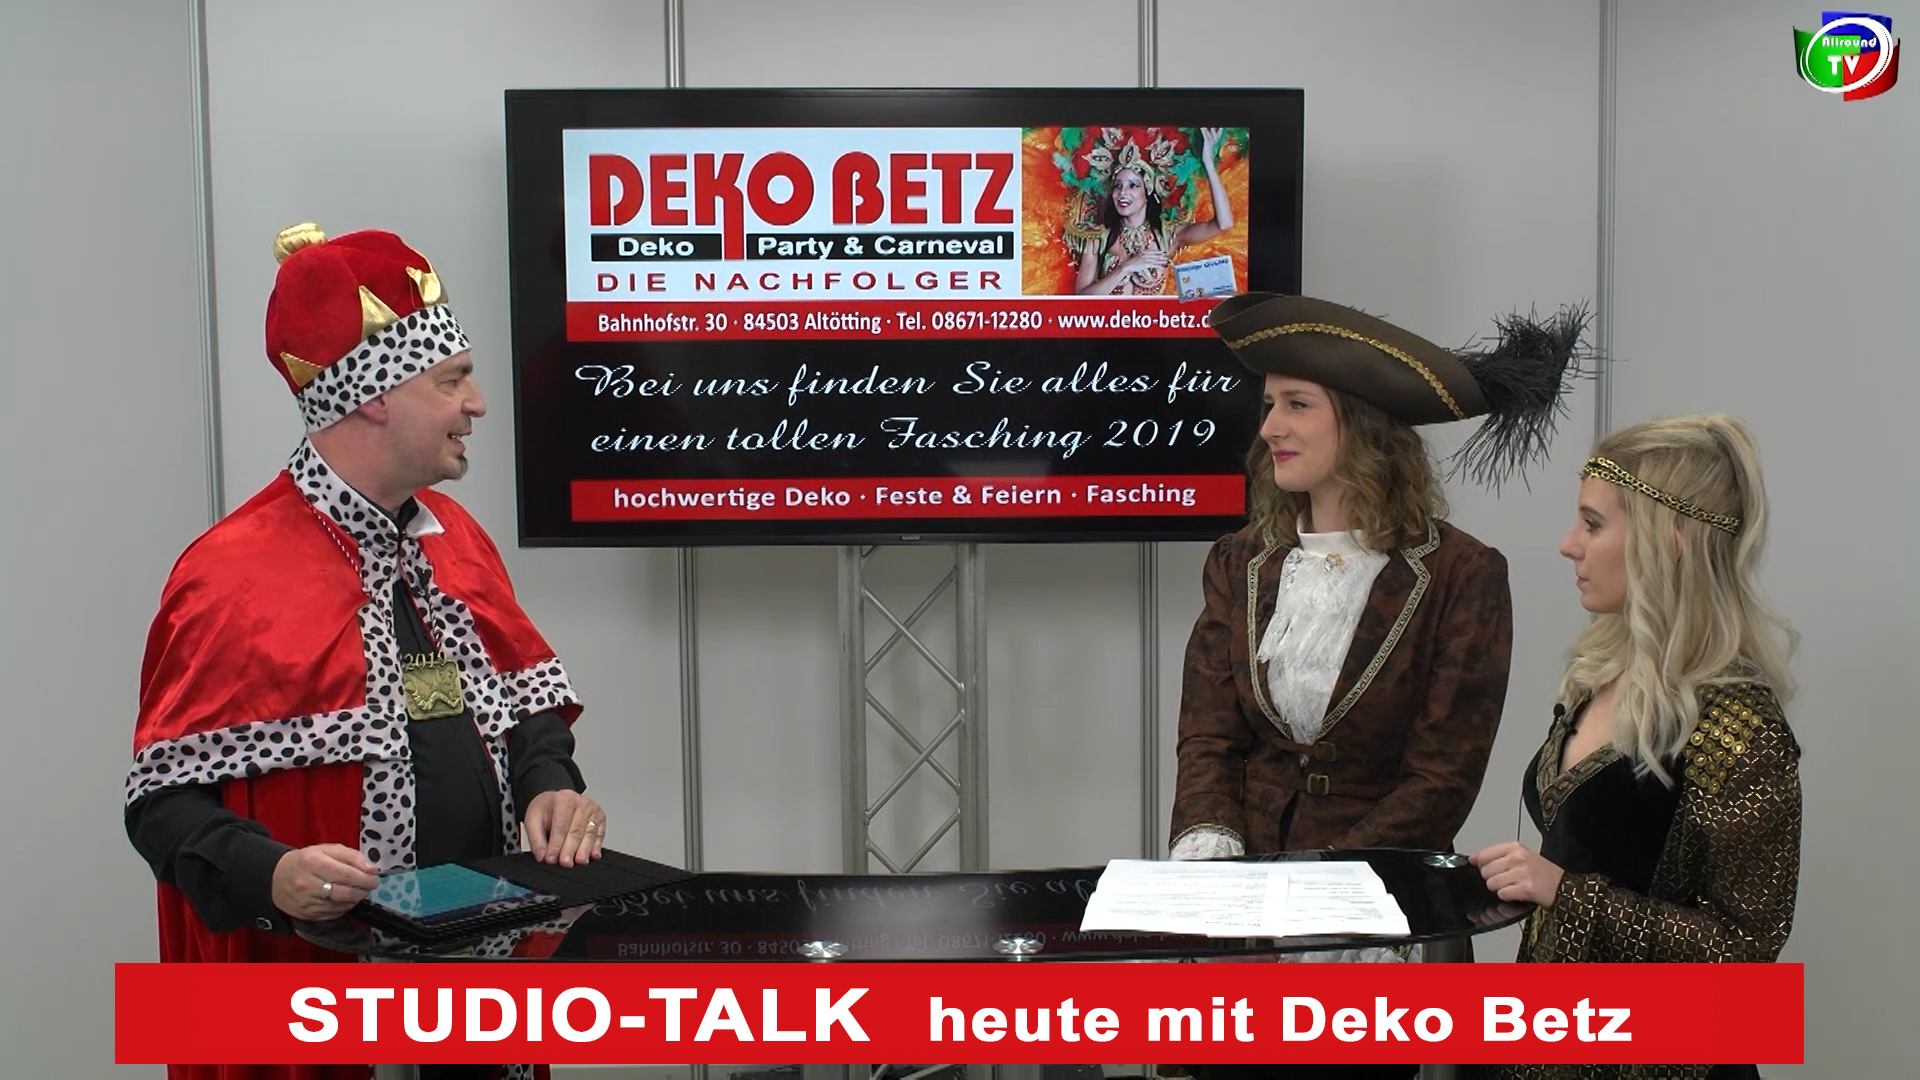 Faschingsideen Trends 2019 Mit Deko Betz Allround Tv